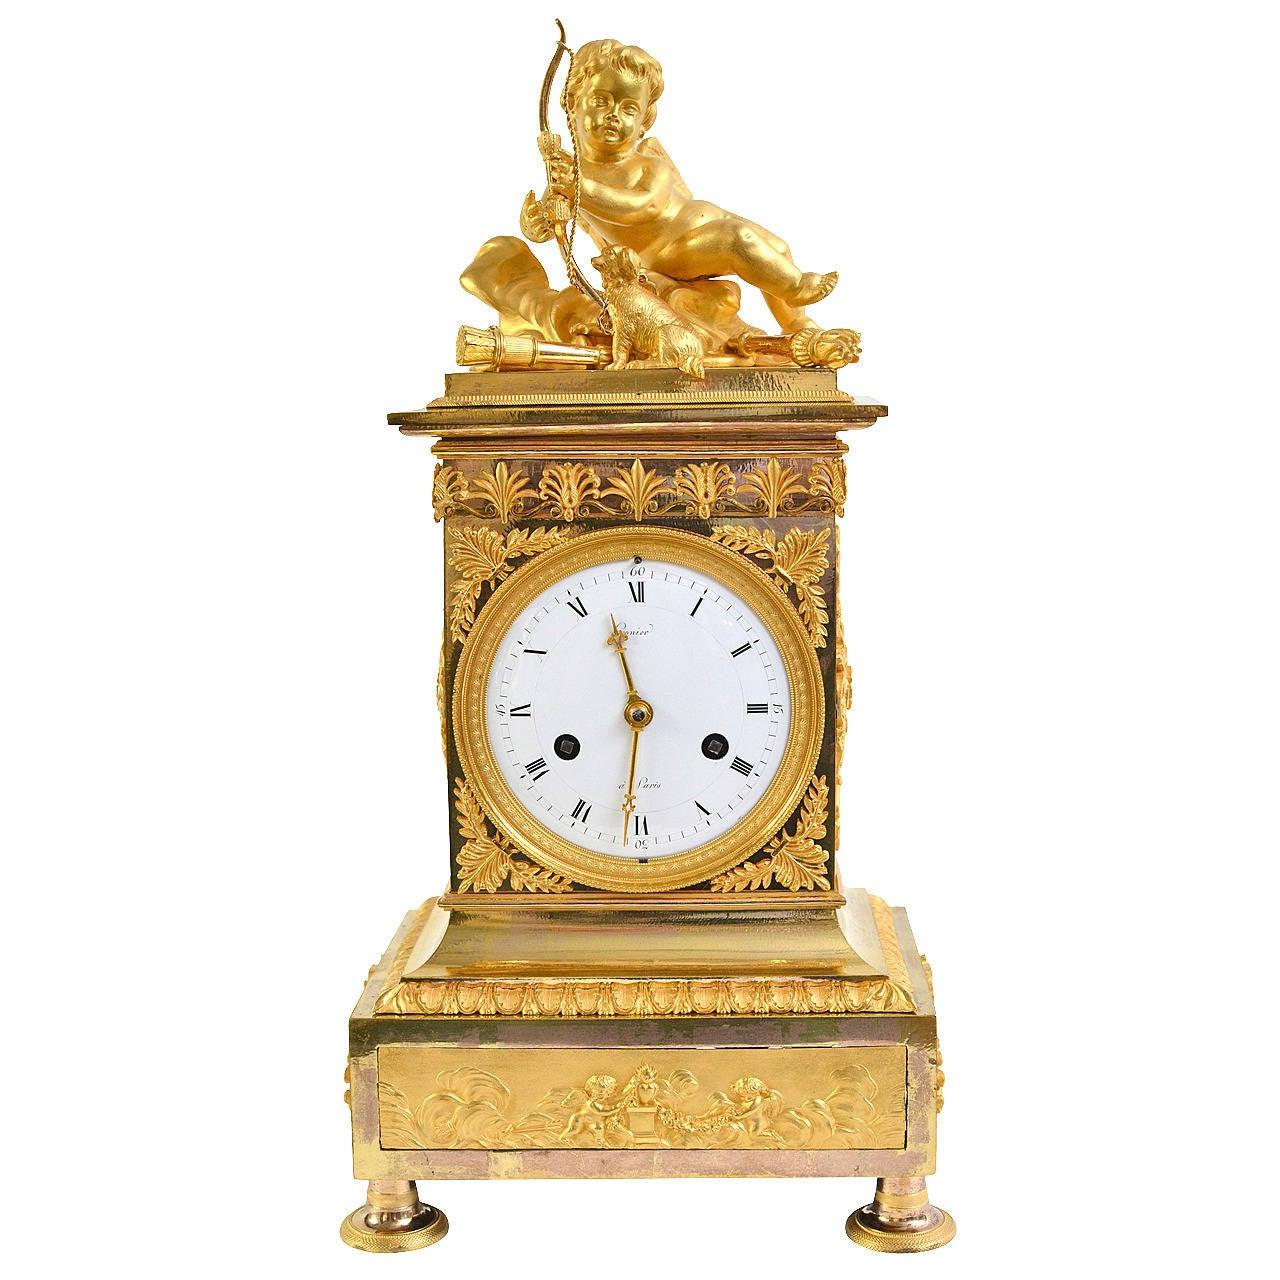 Empire Gilt Bronze Mantel Clock, Paris, Early 19th Century